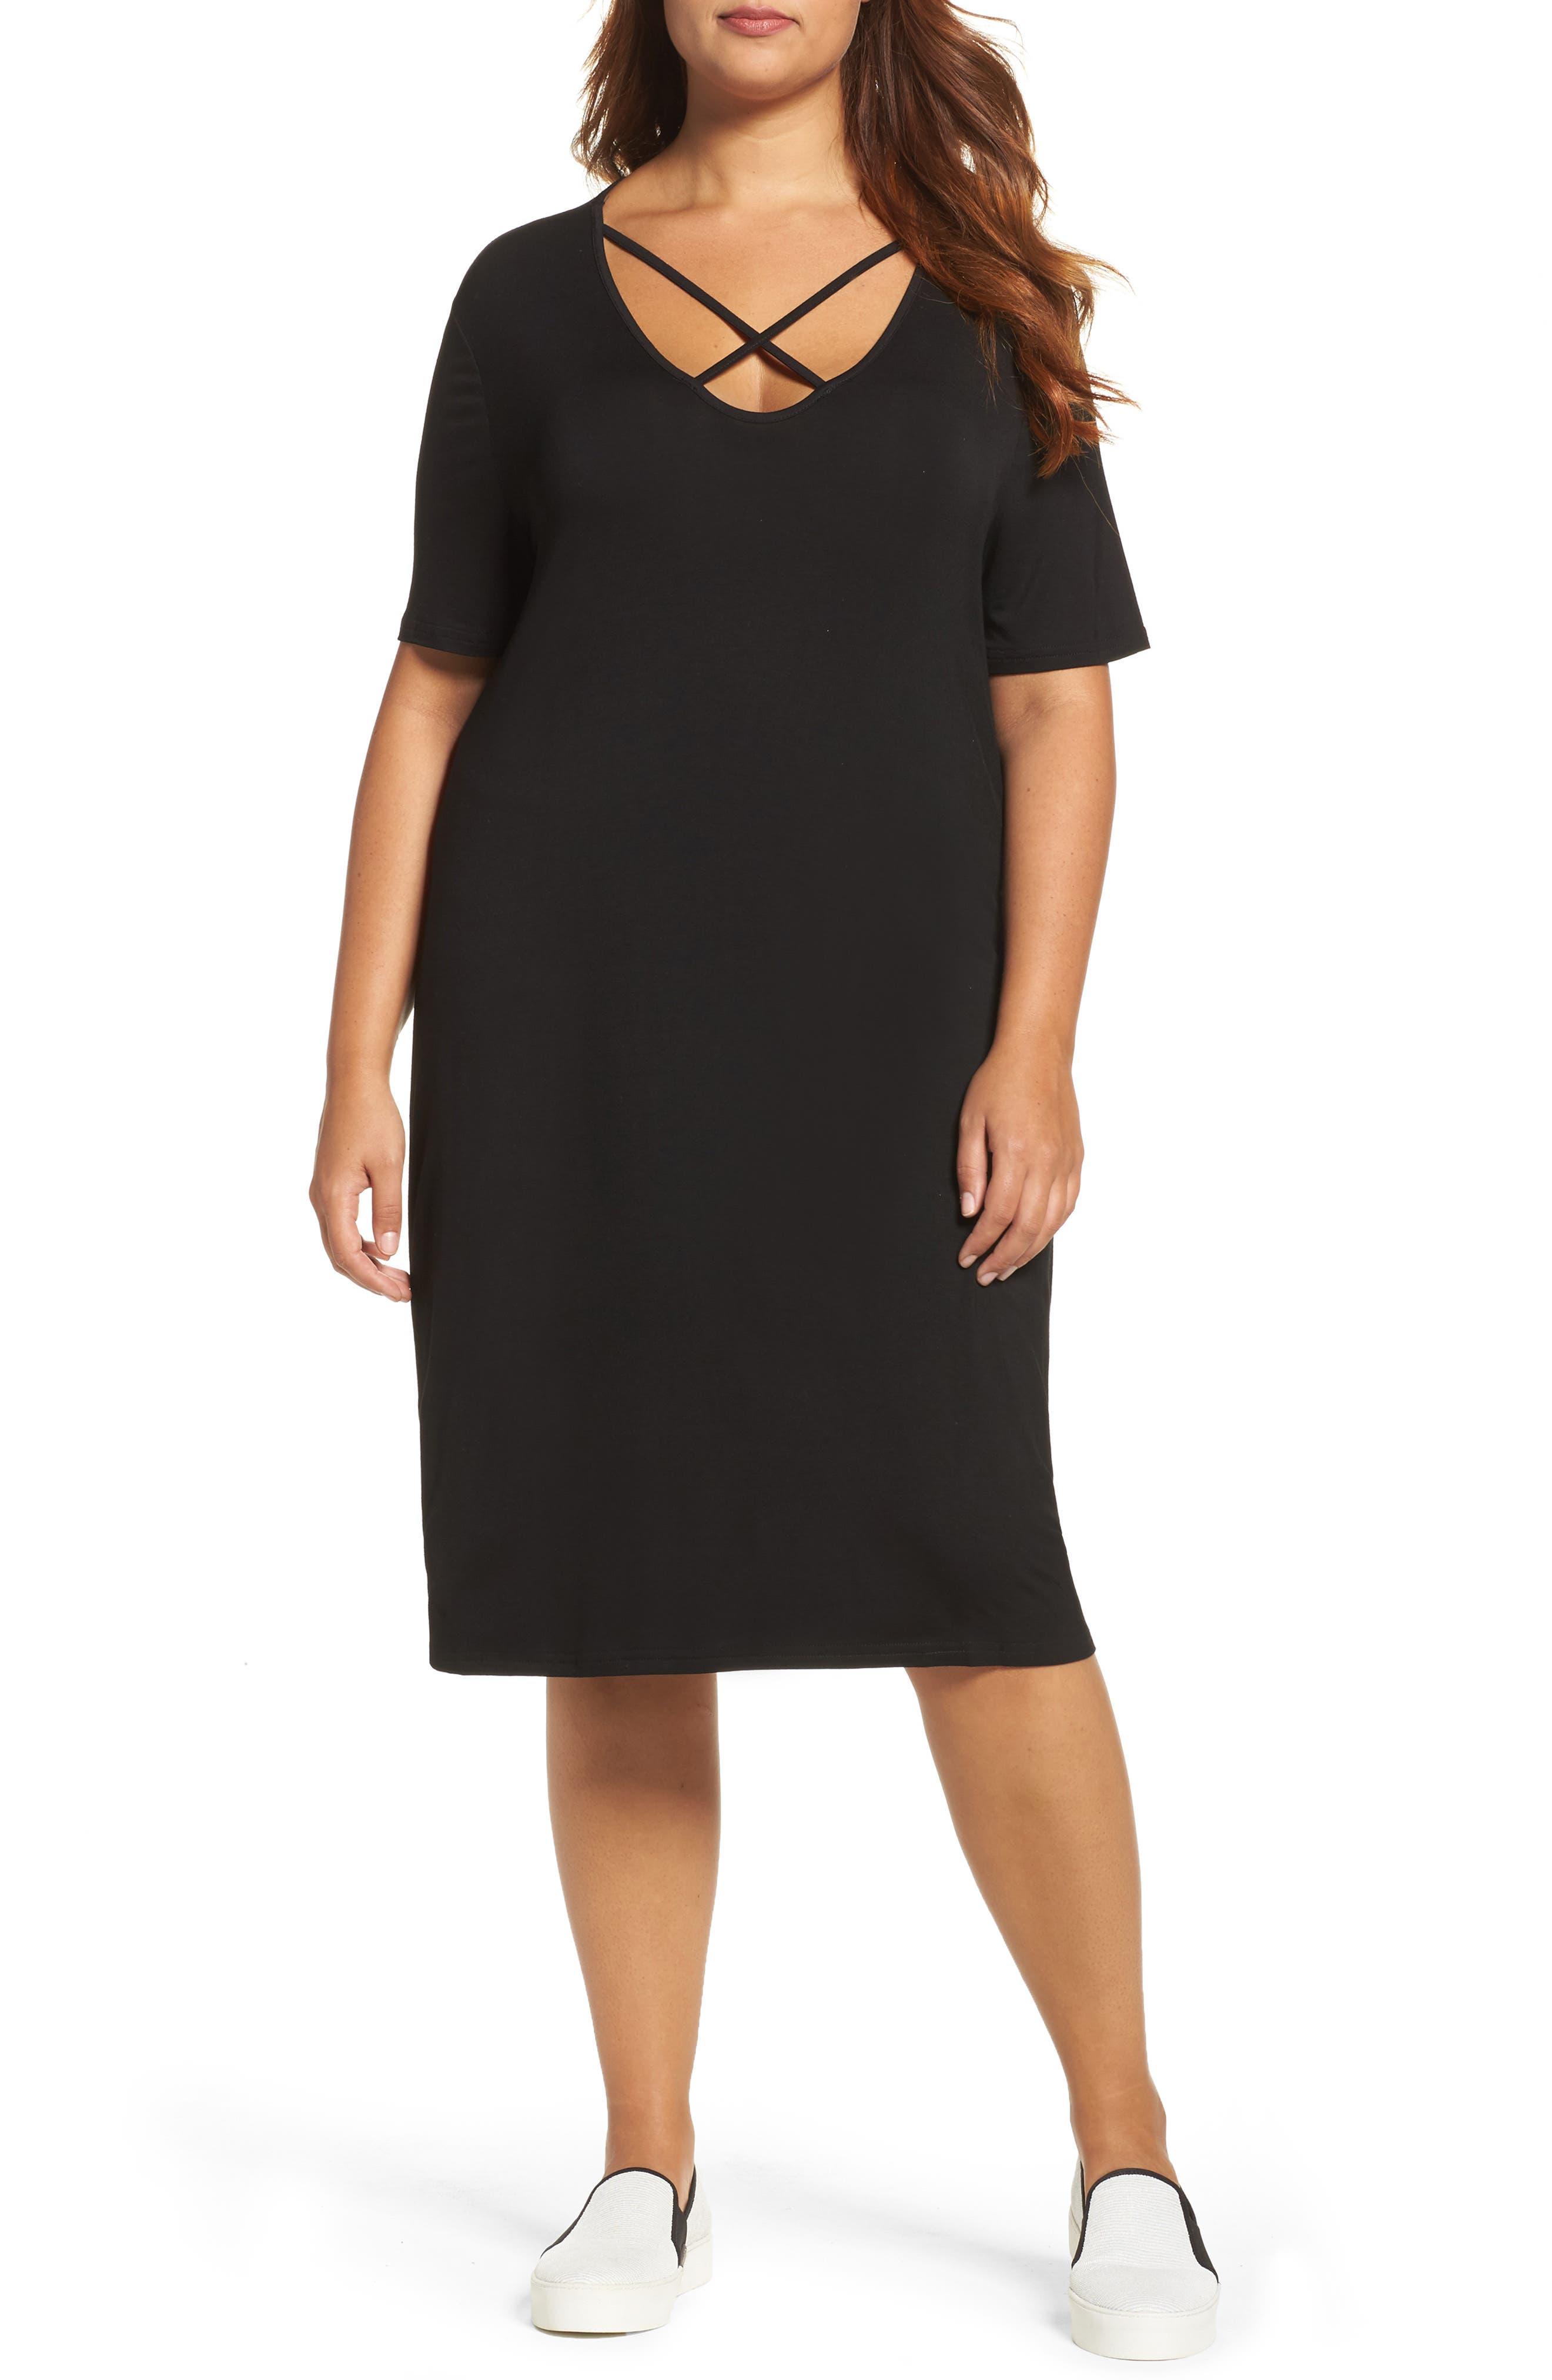 Main Image - Glamorous Crisscross Neck T-Shirt Dress (Plus Size)